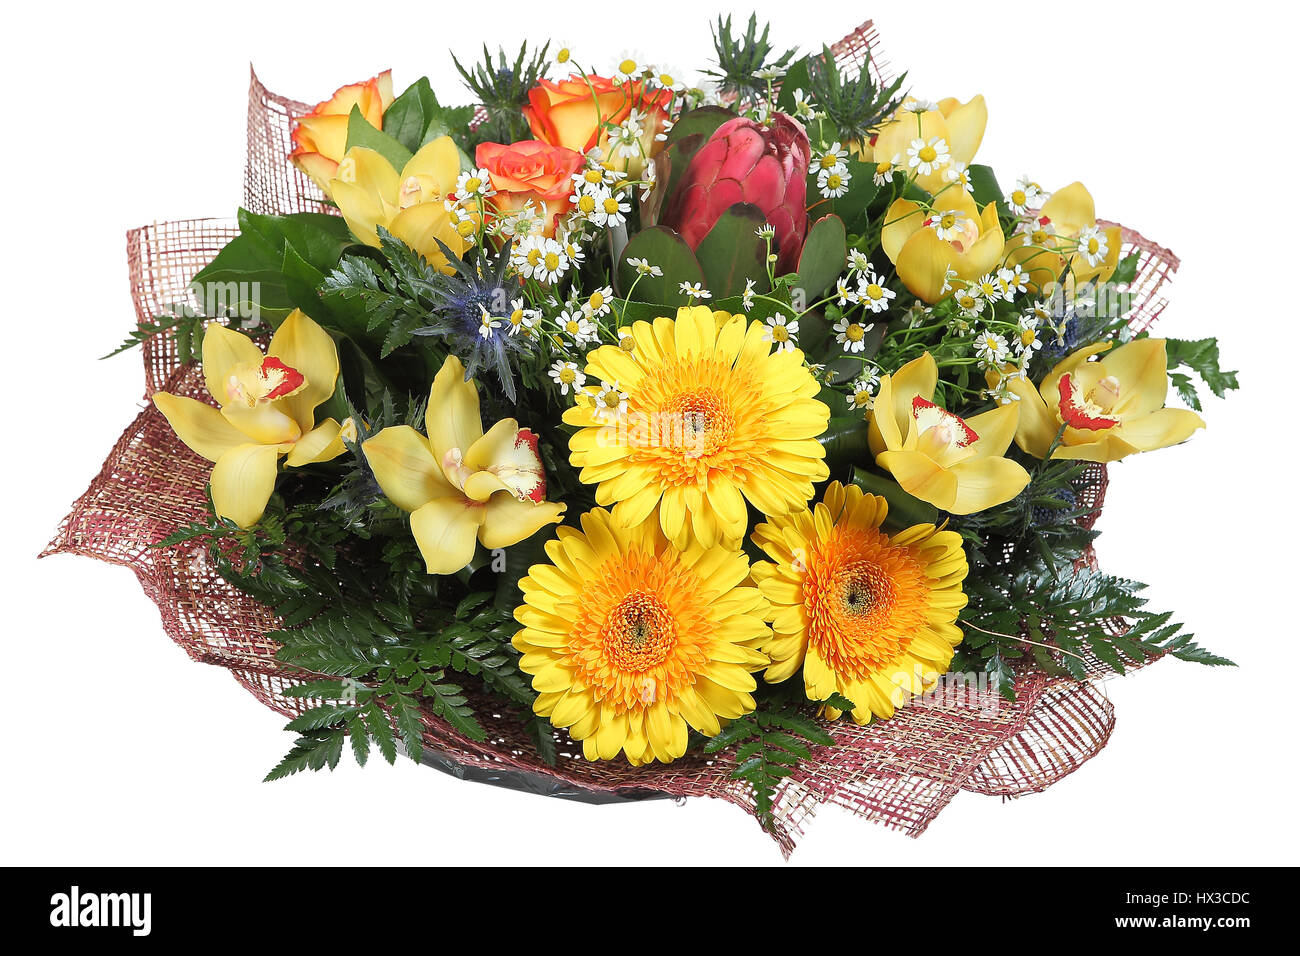 Flower Arrangement Large Mixed Floral Bouquet Of Yellow Gerberas